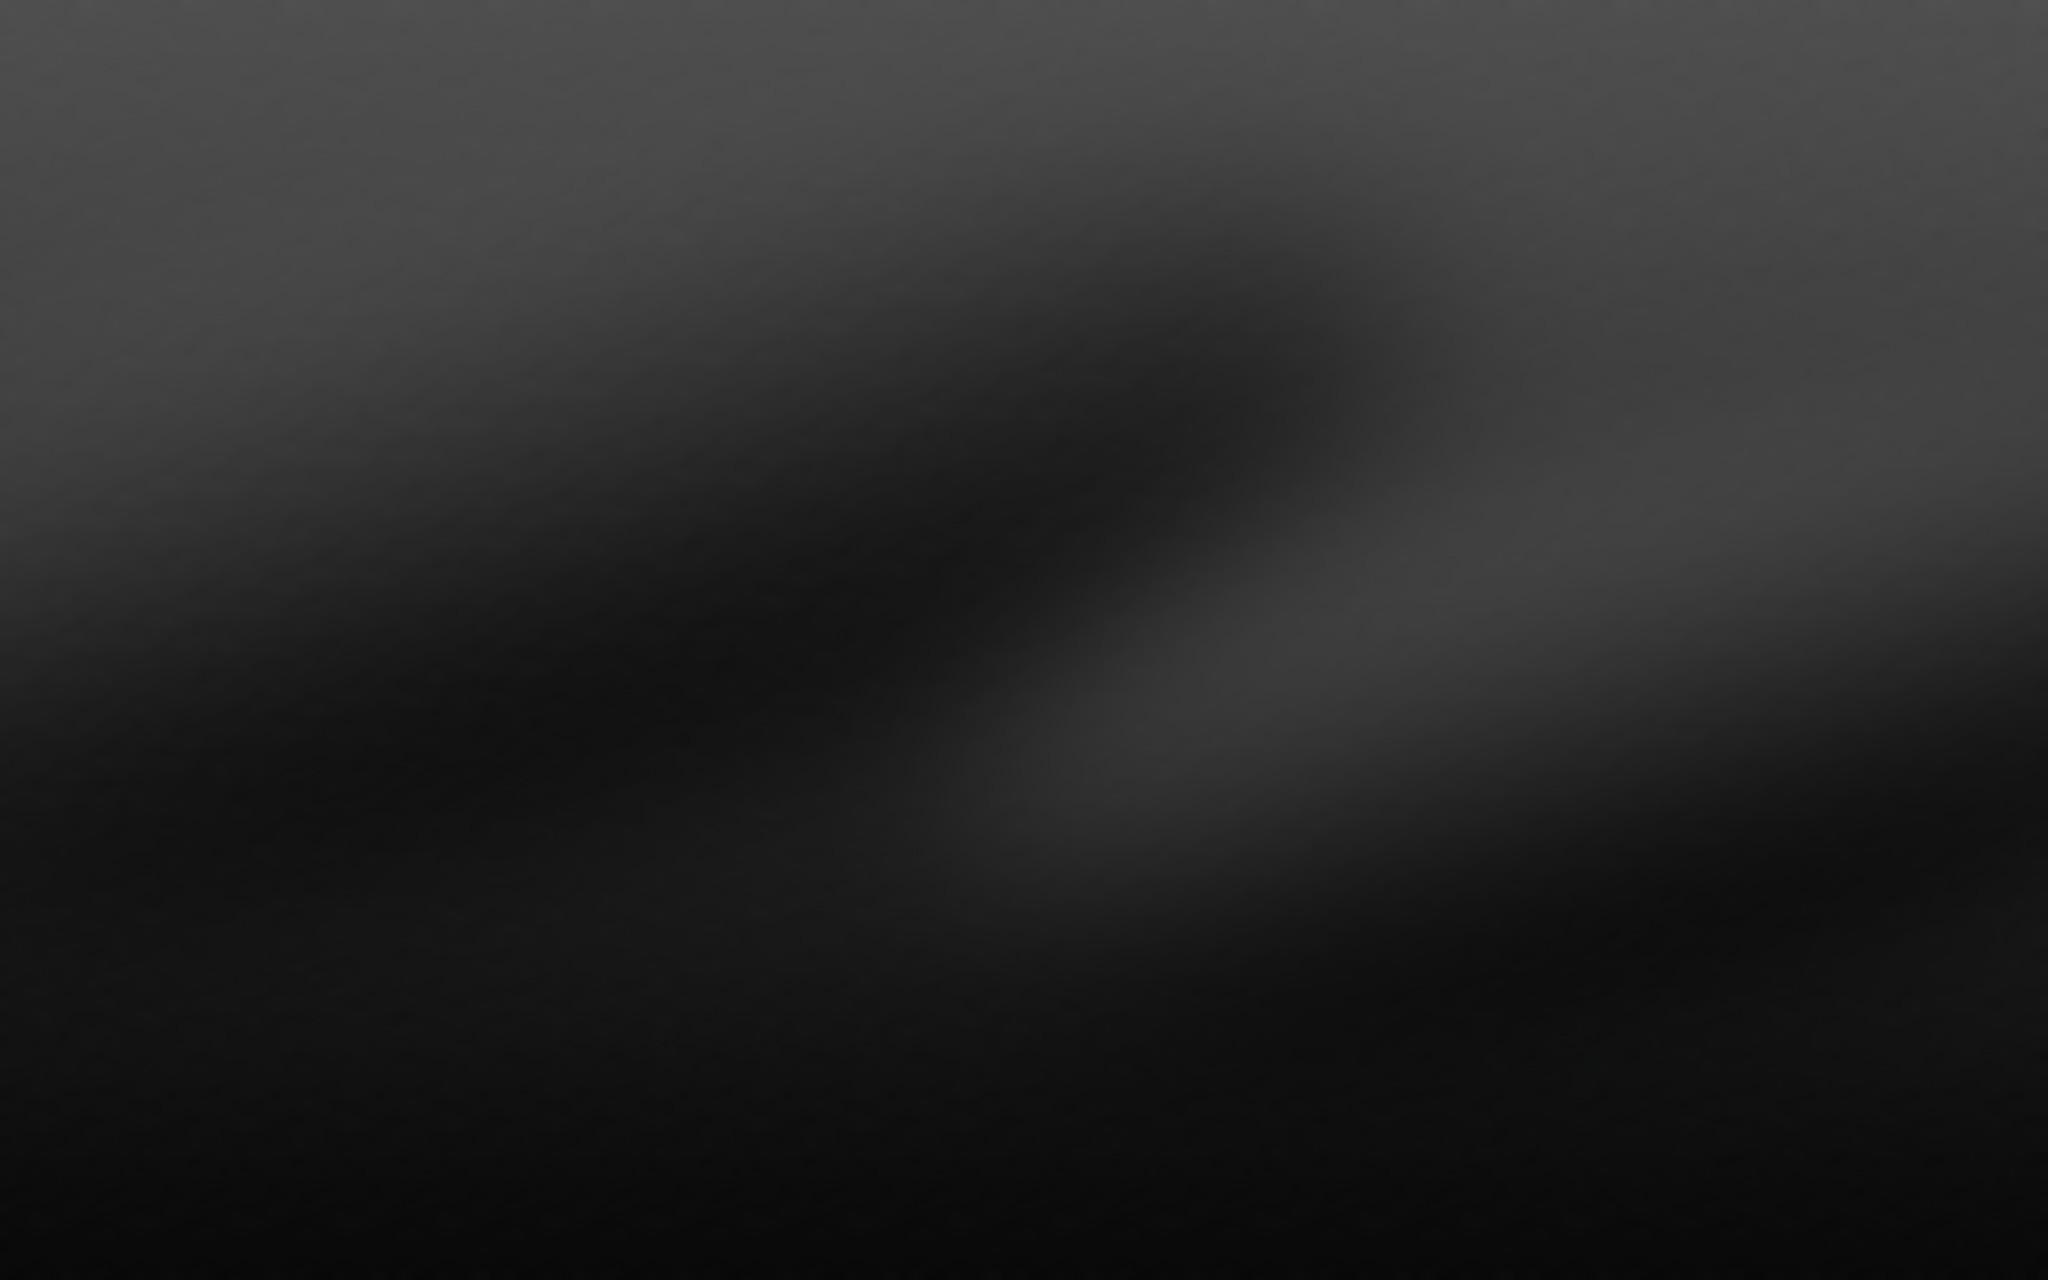 67+ Black Desktop